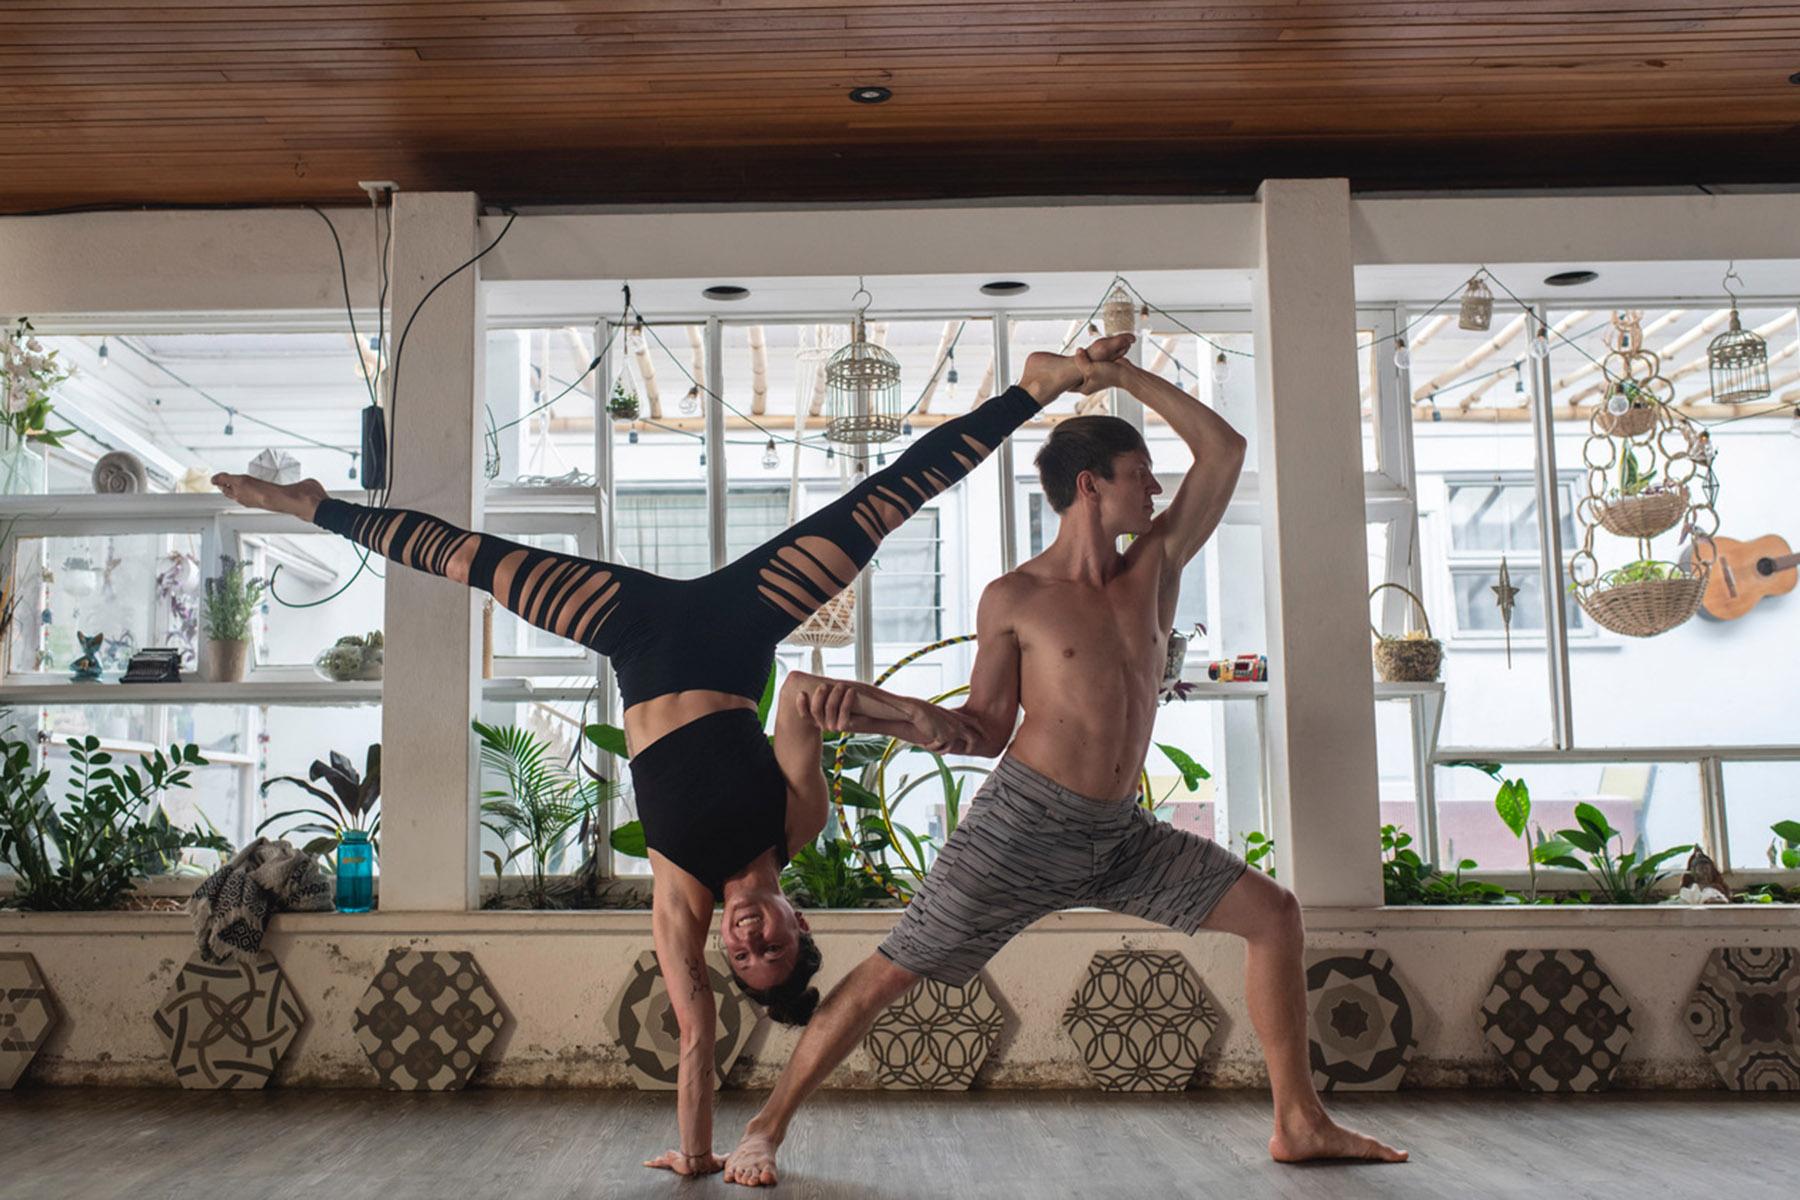 Julia_Kuehner_Handstand_Balancing